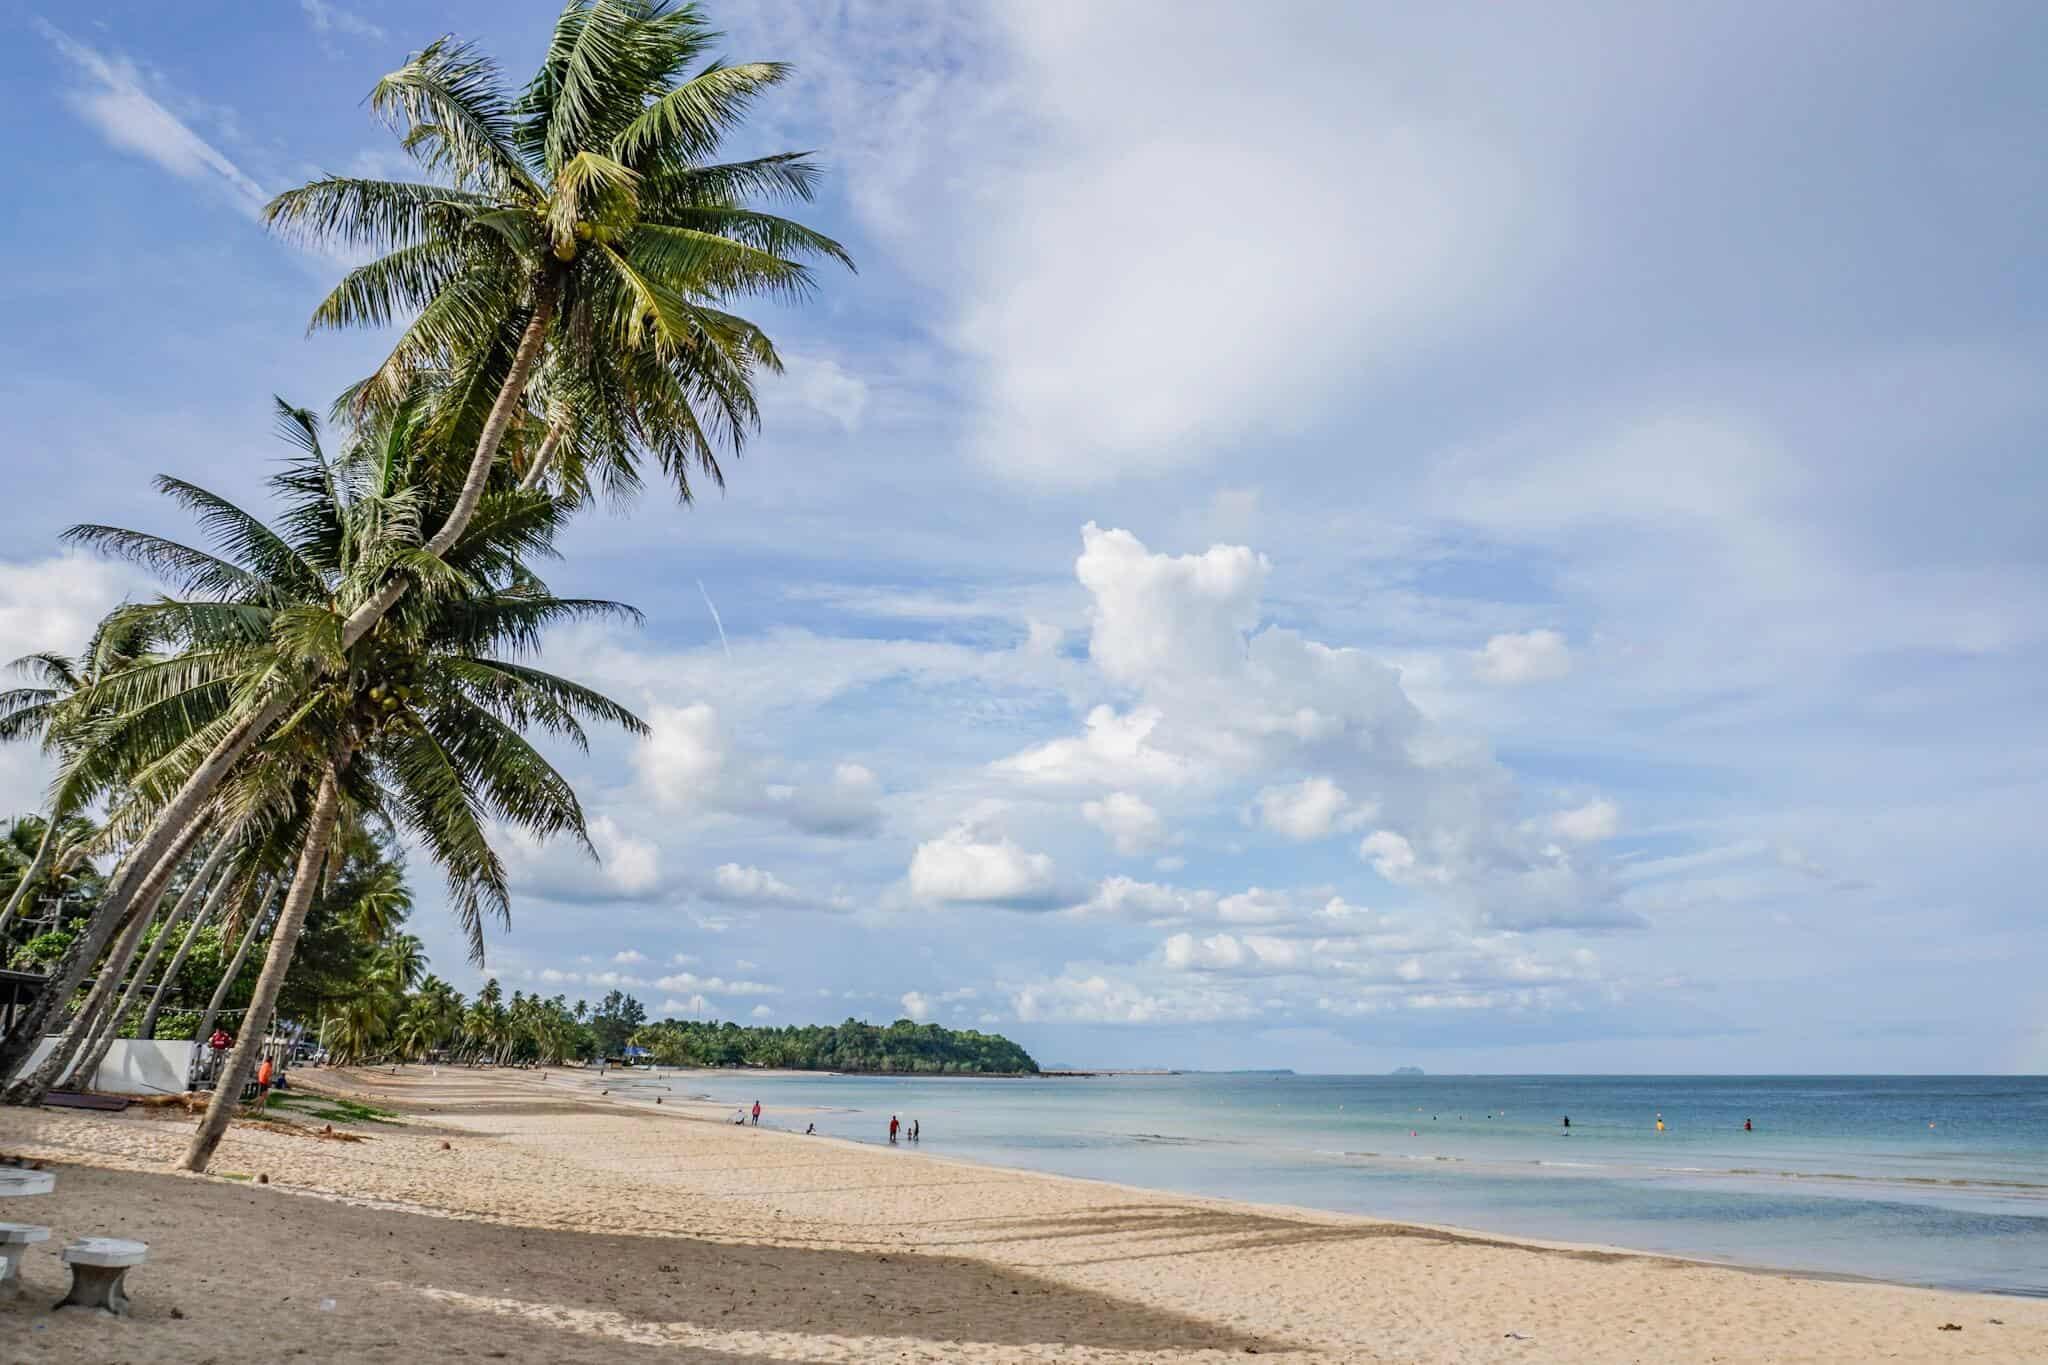 Thung Wua Lan - Chumphon's Most Beautiful Beach